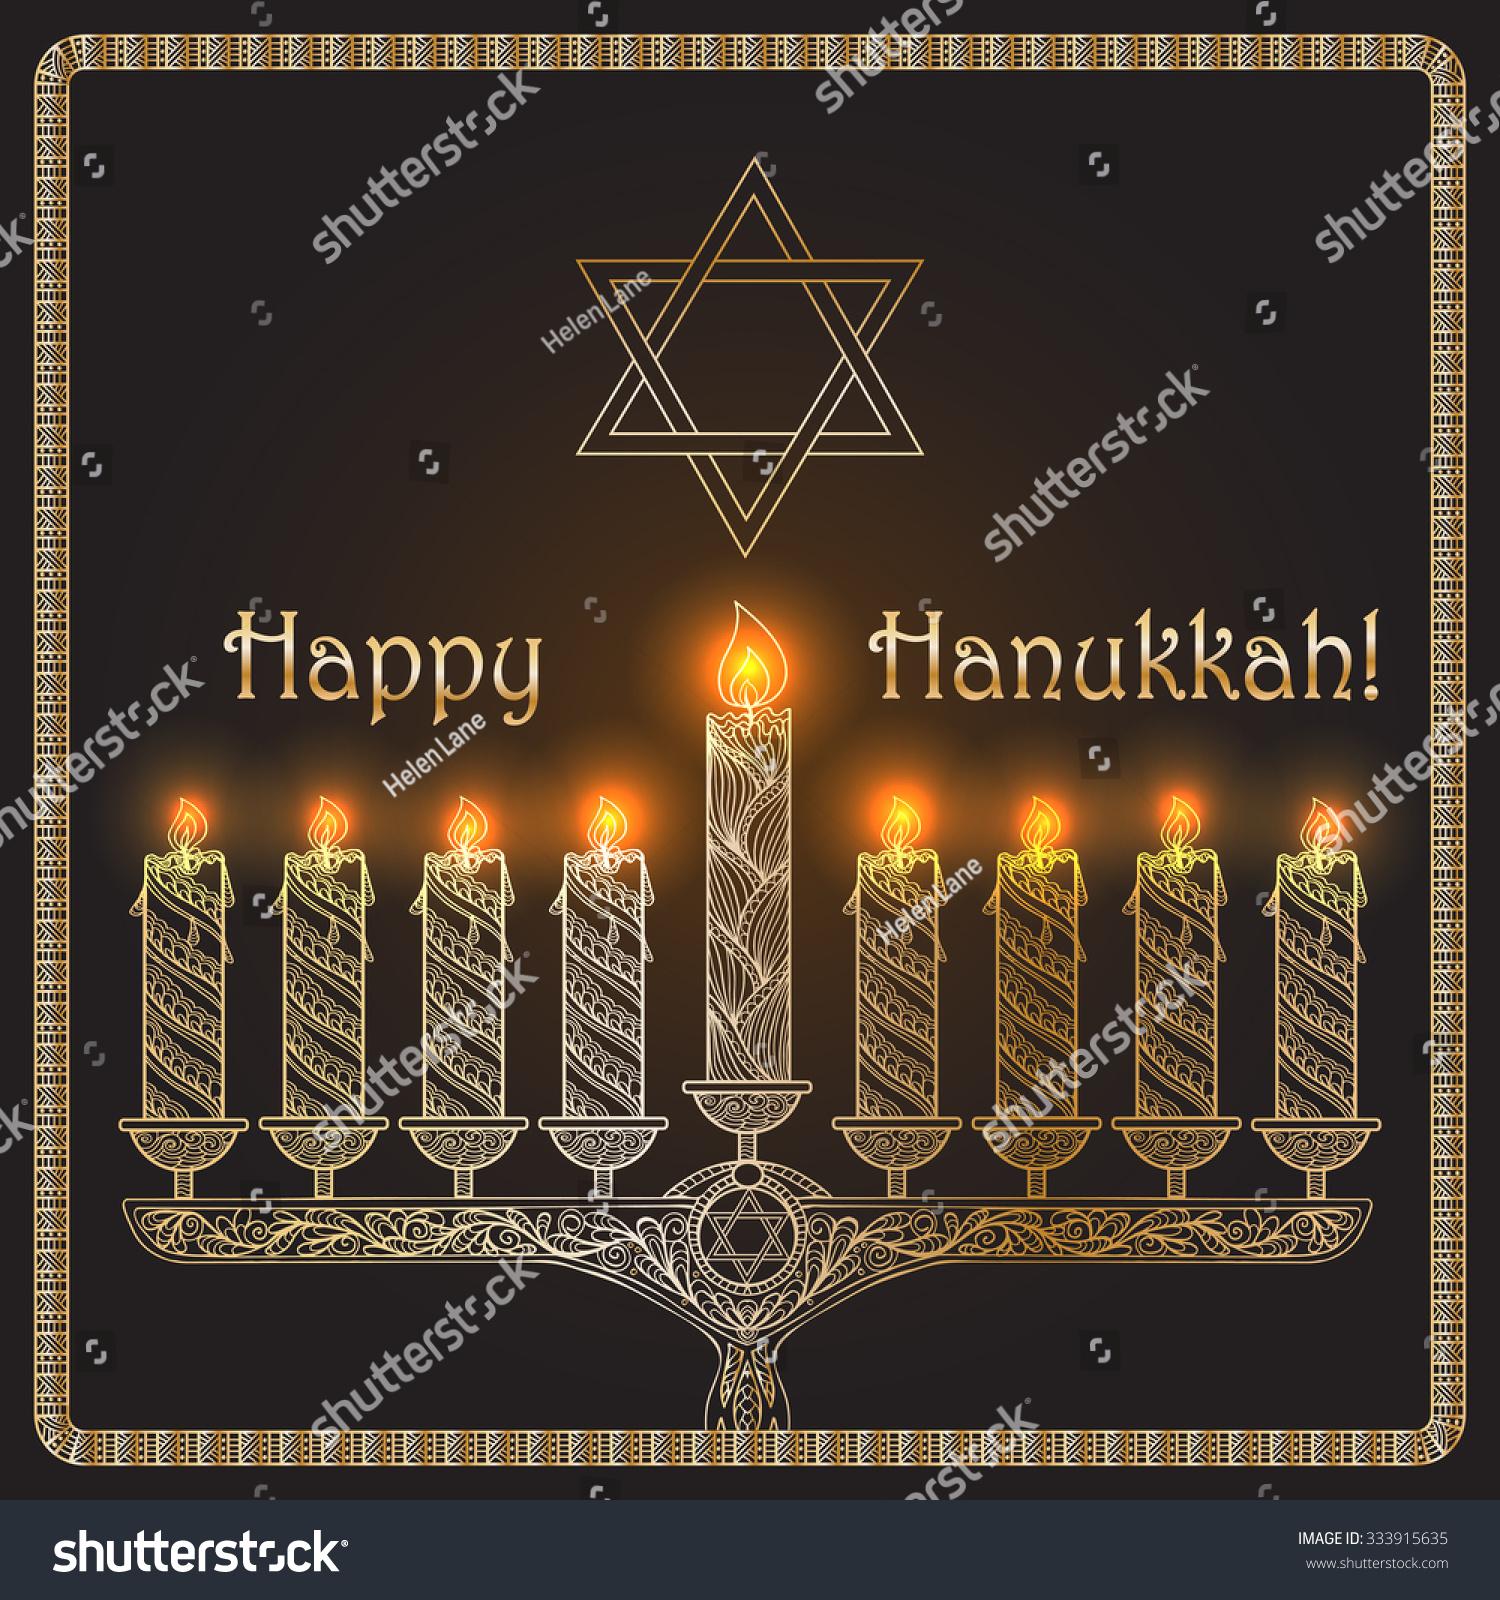 Background Famous Symbols Jewish Holiday Hanukkah Stock Vector